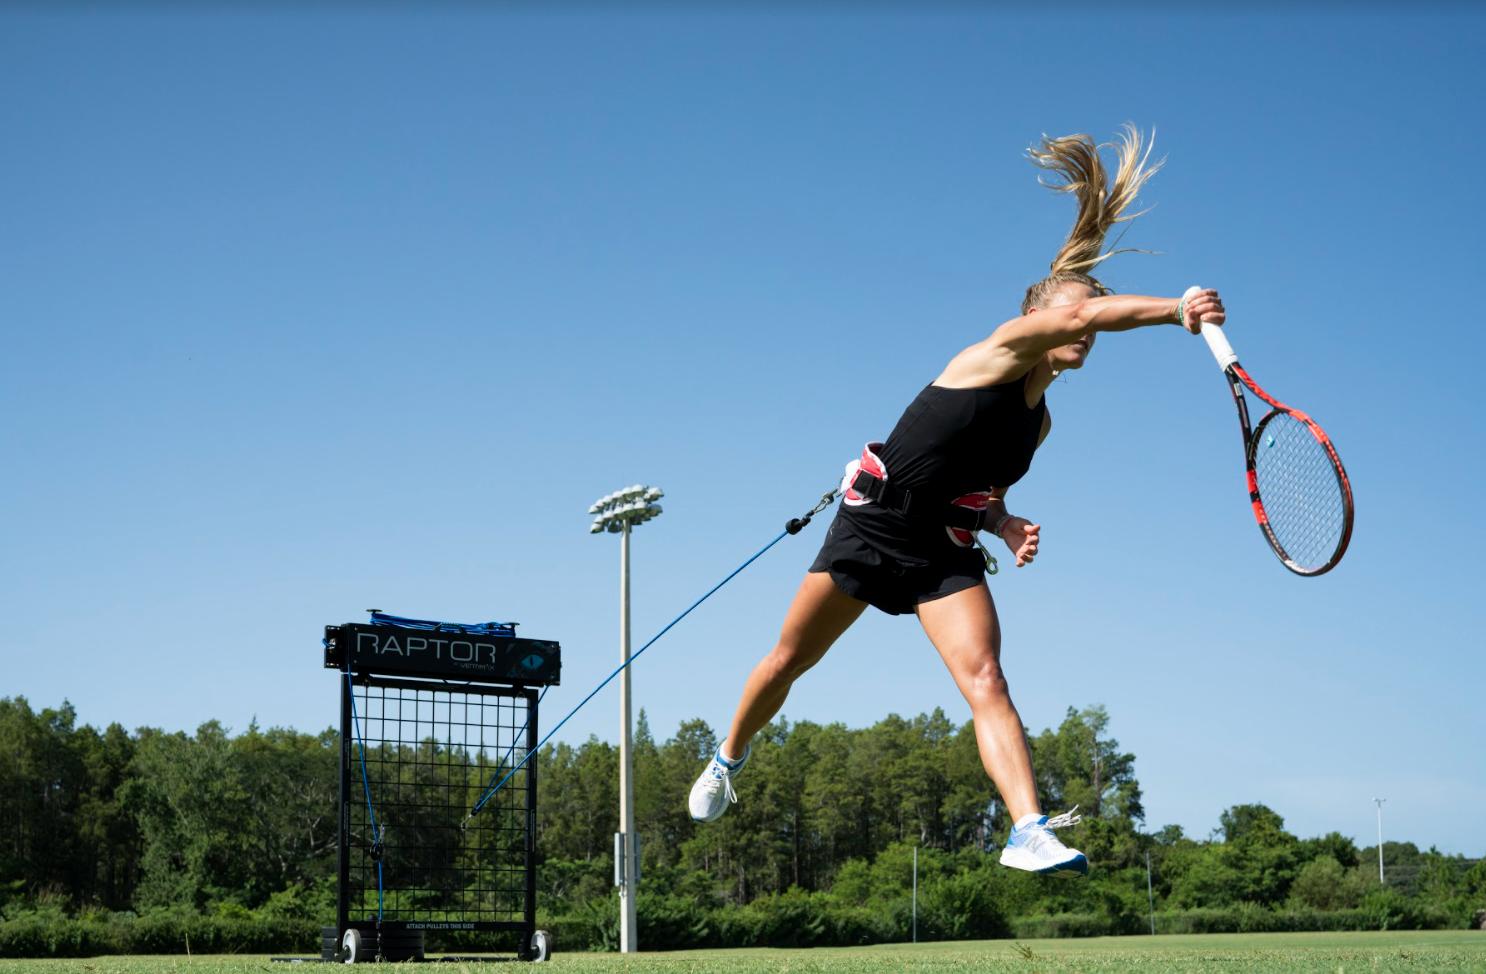 Tennis girl serving training on VertiMax Raptor